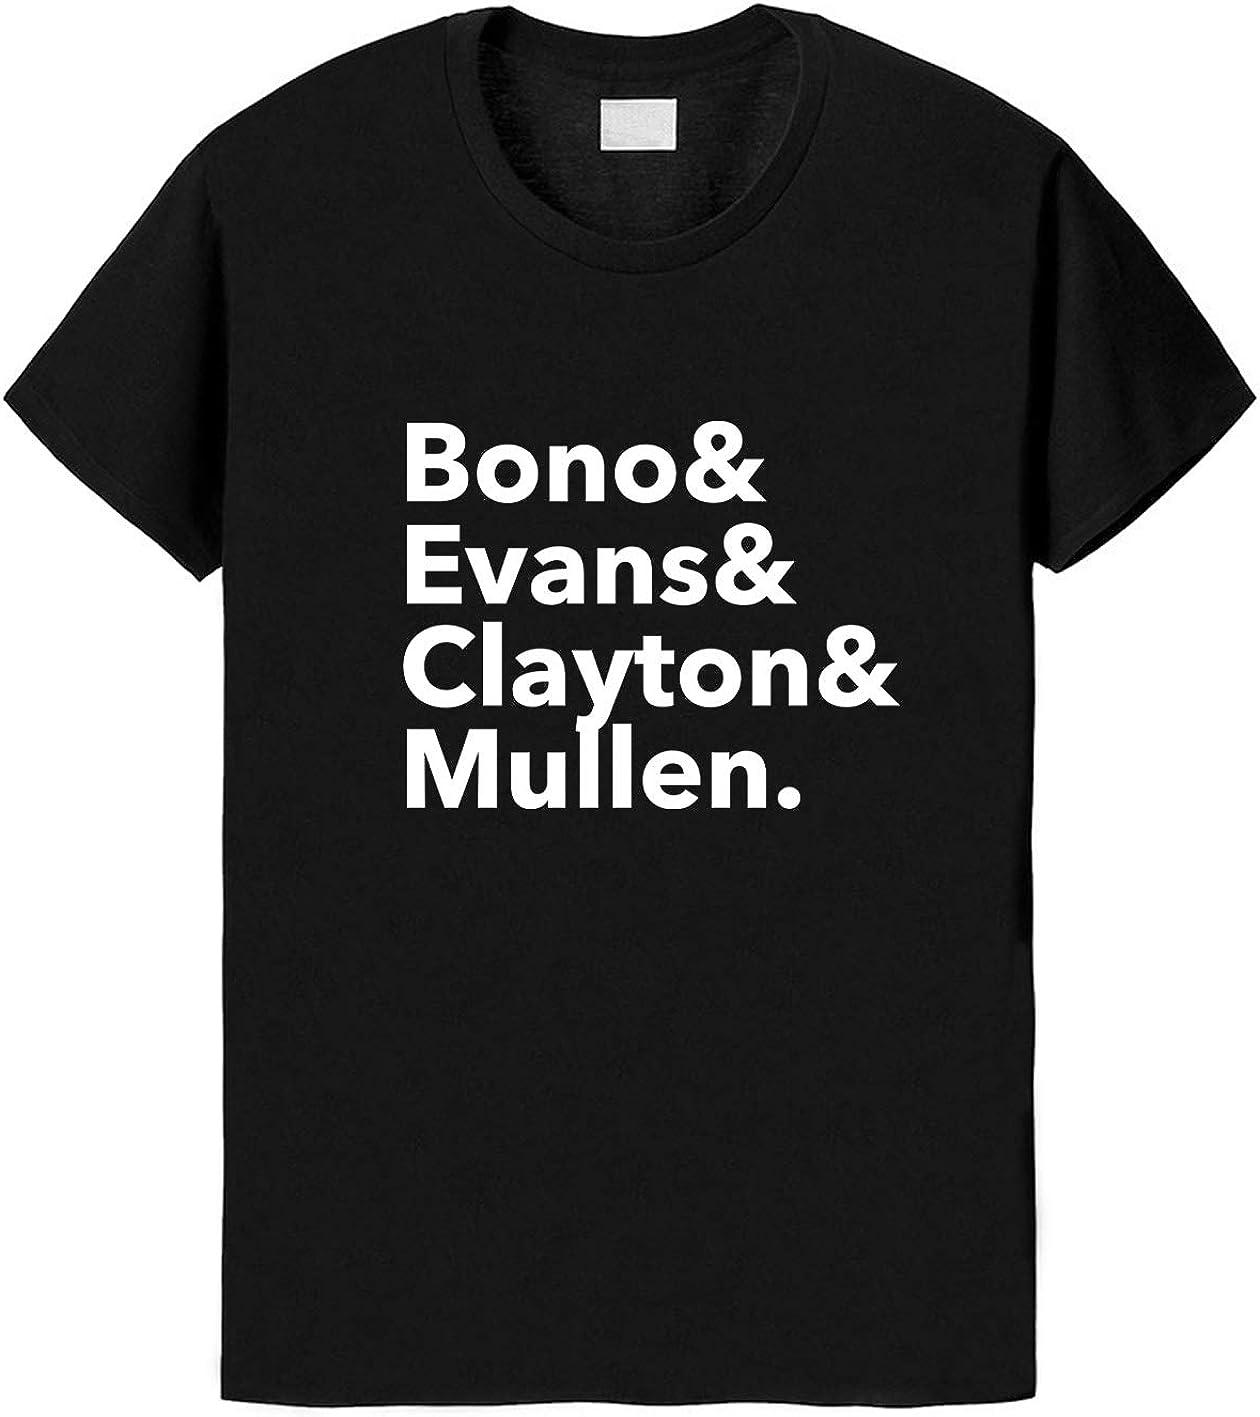 Fellow Friends Band Members Line Up T-Shirt Unisex